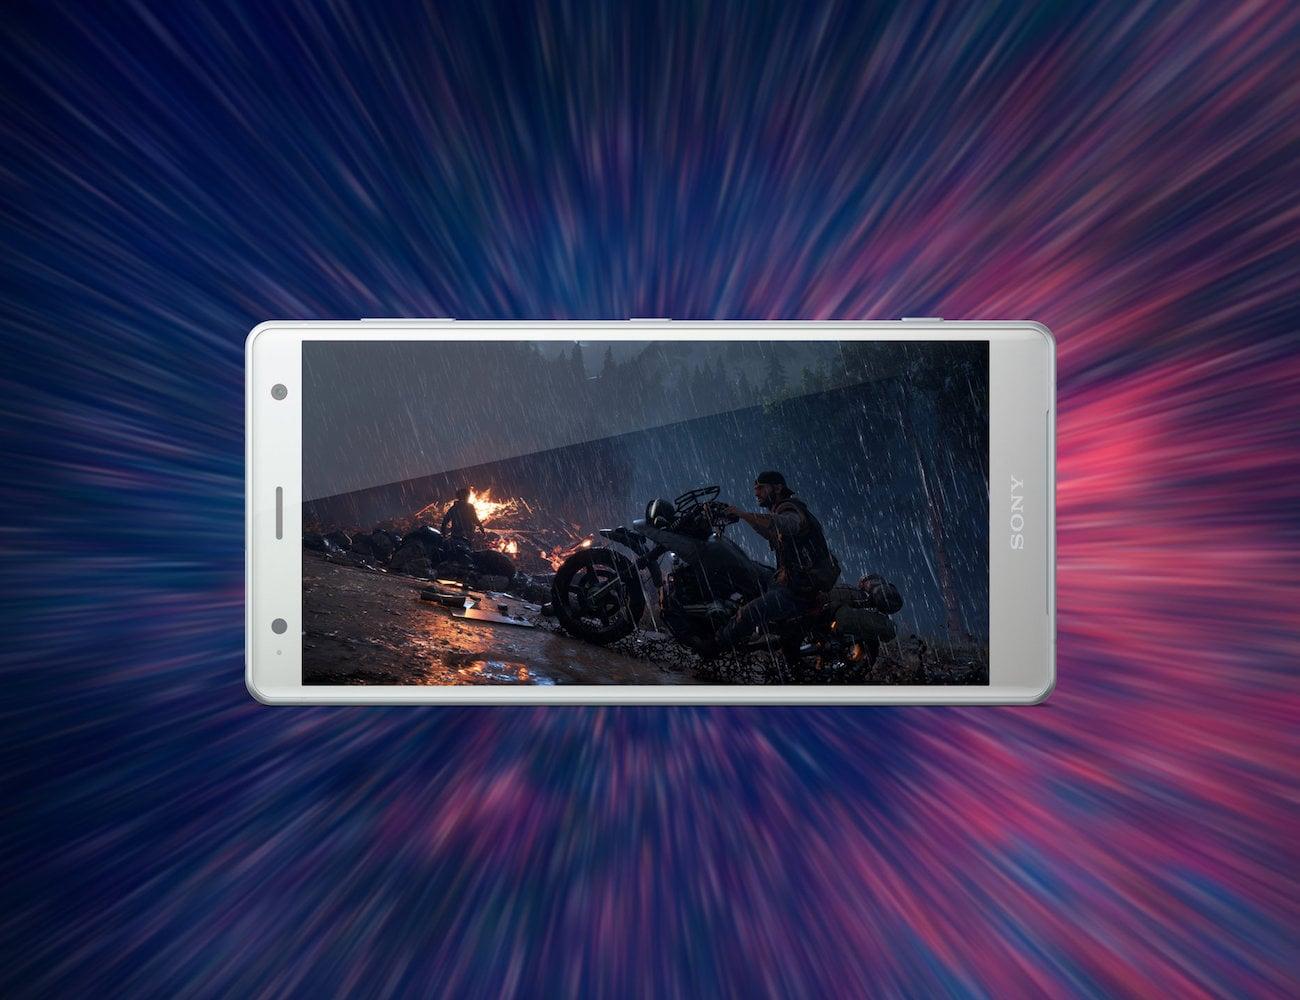 Sony Xperia XZ2 4K HDR Video Smartphone